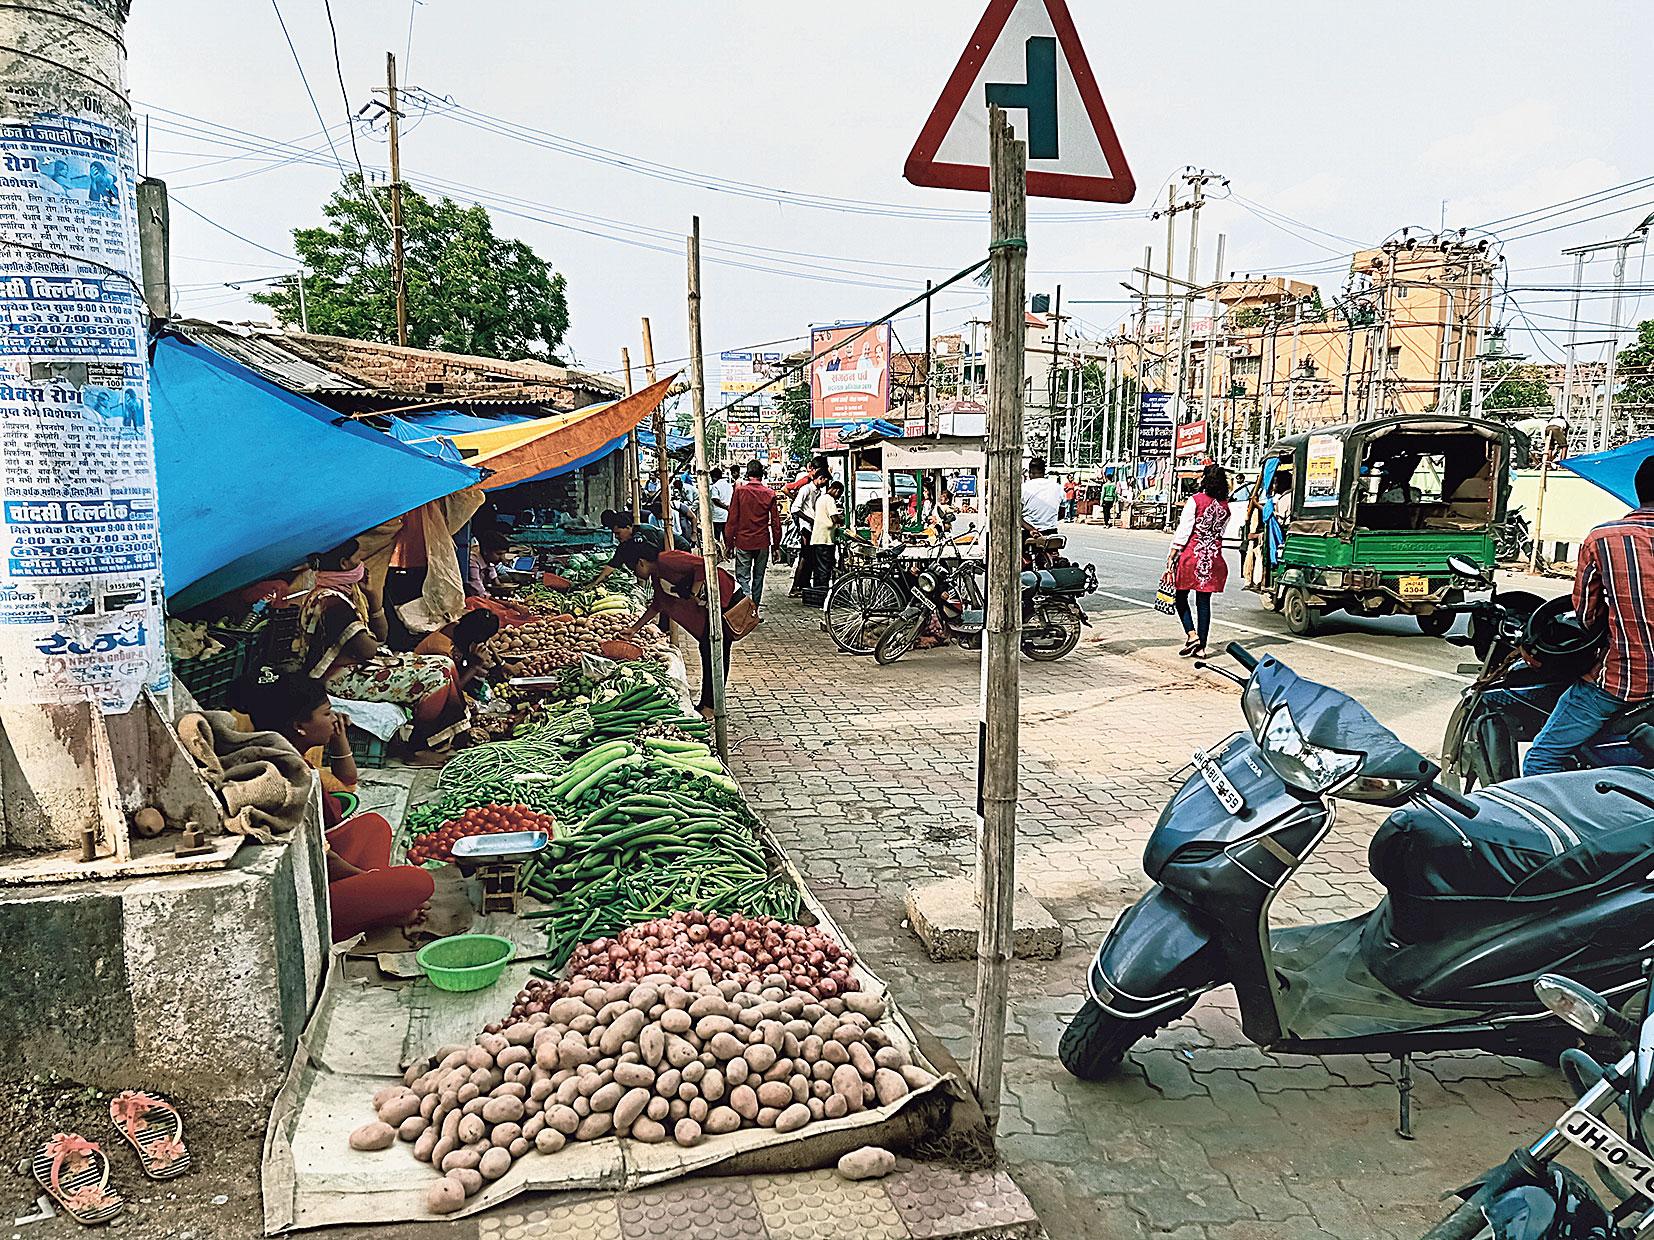 The vegetable market at Kokar Chowk in Ranchi on Saturday.